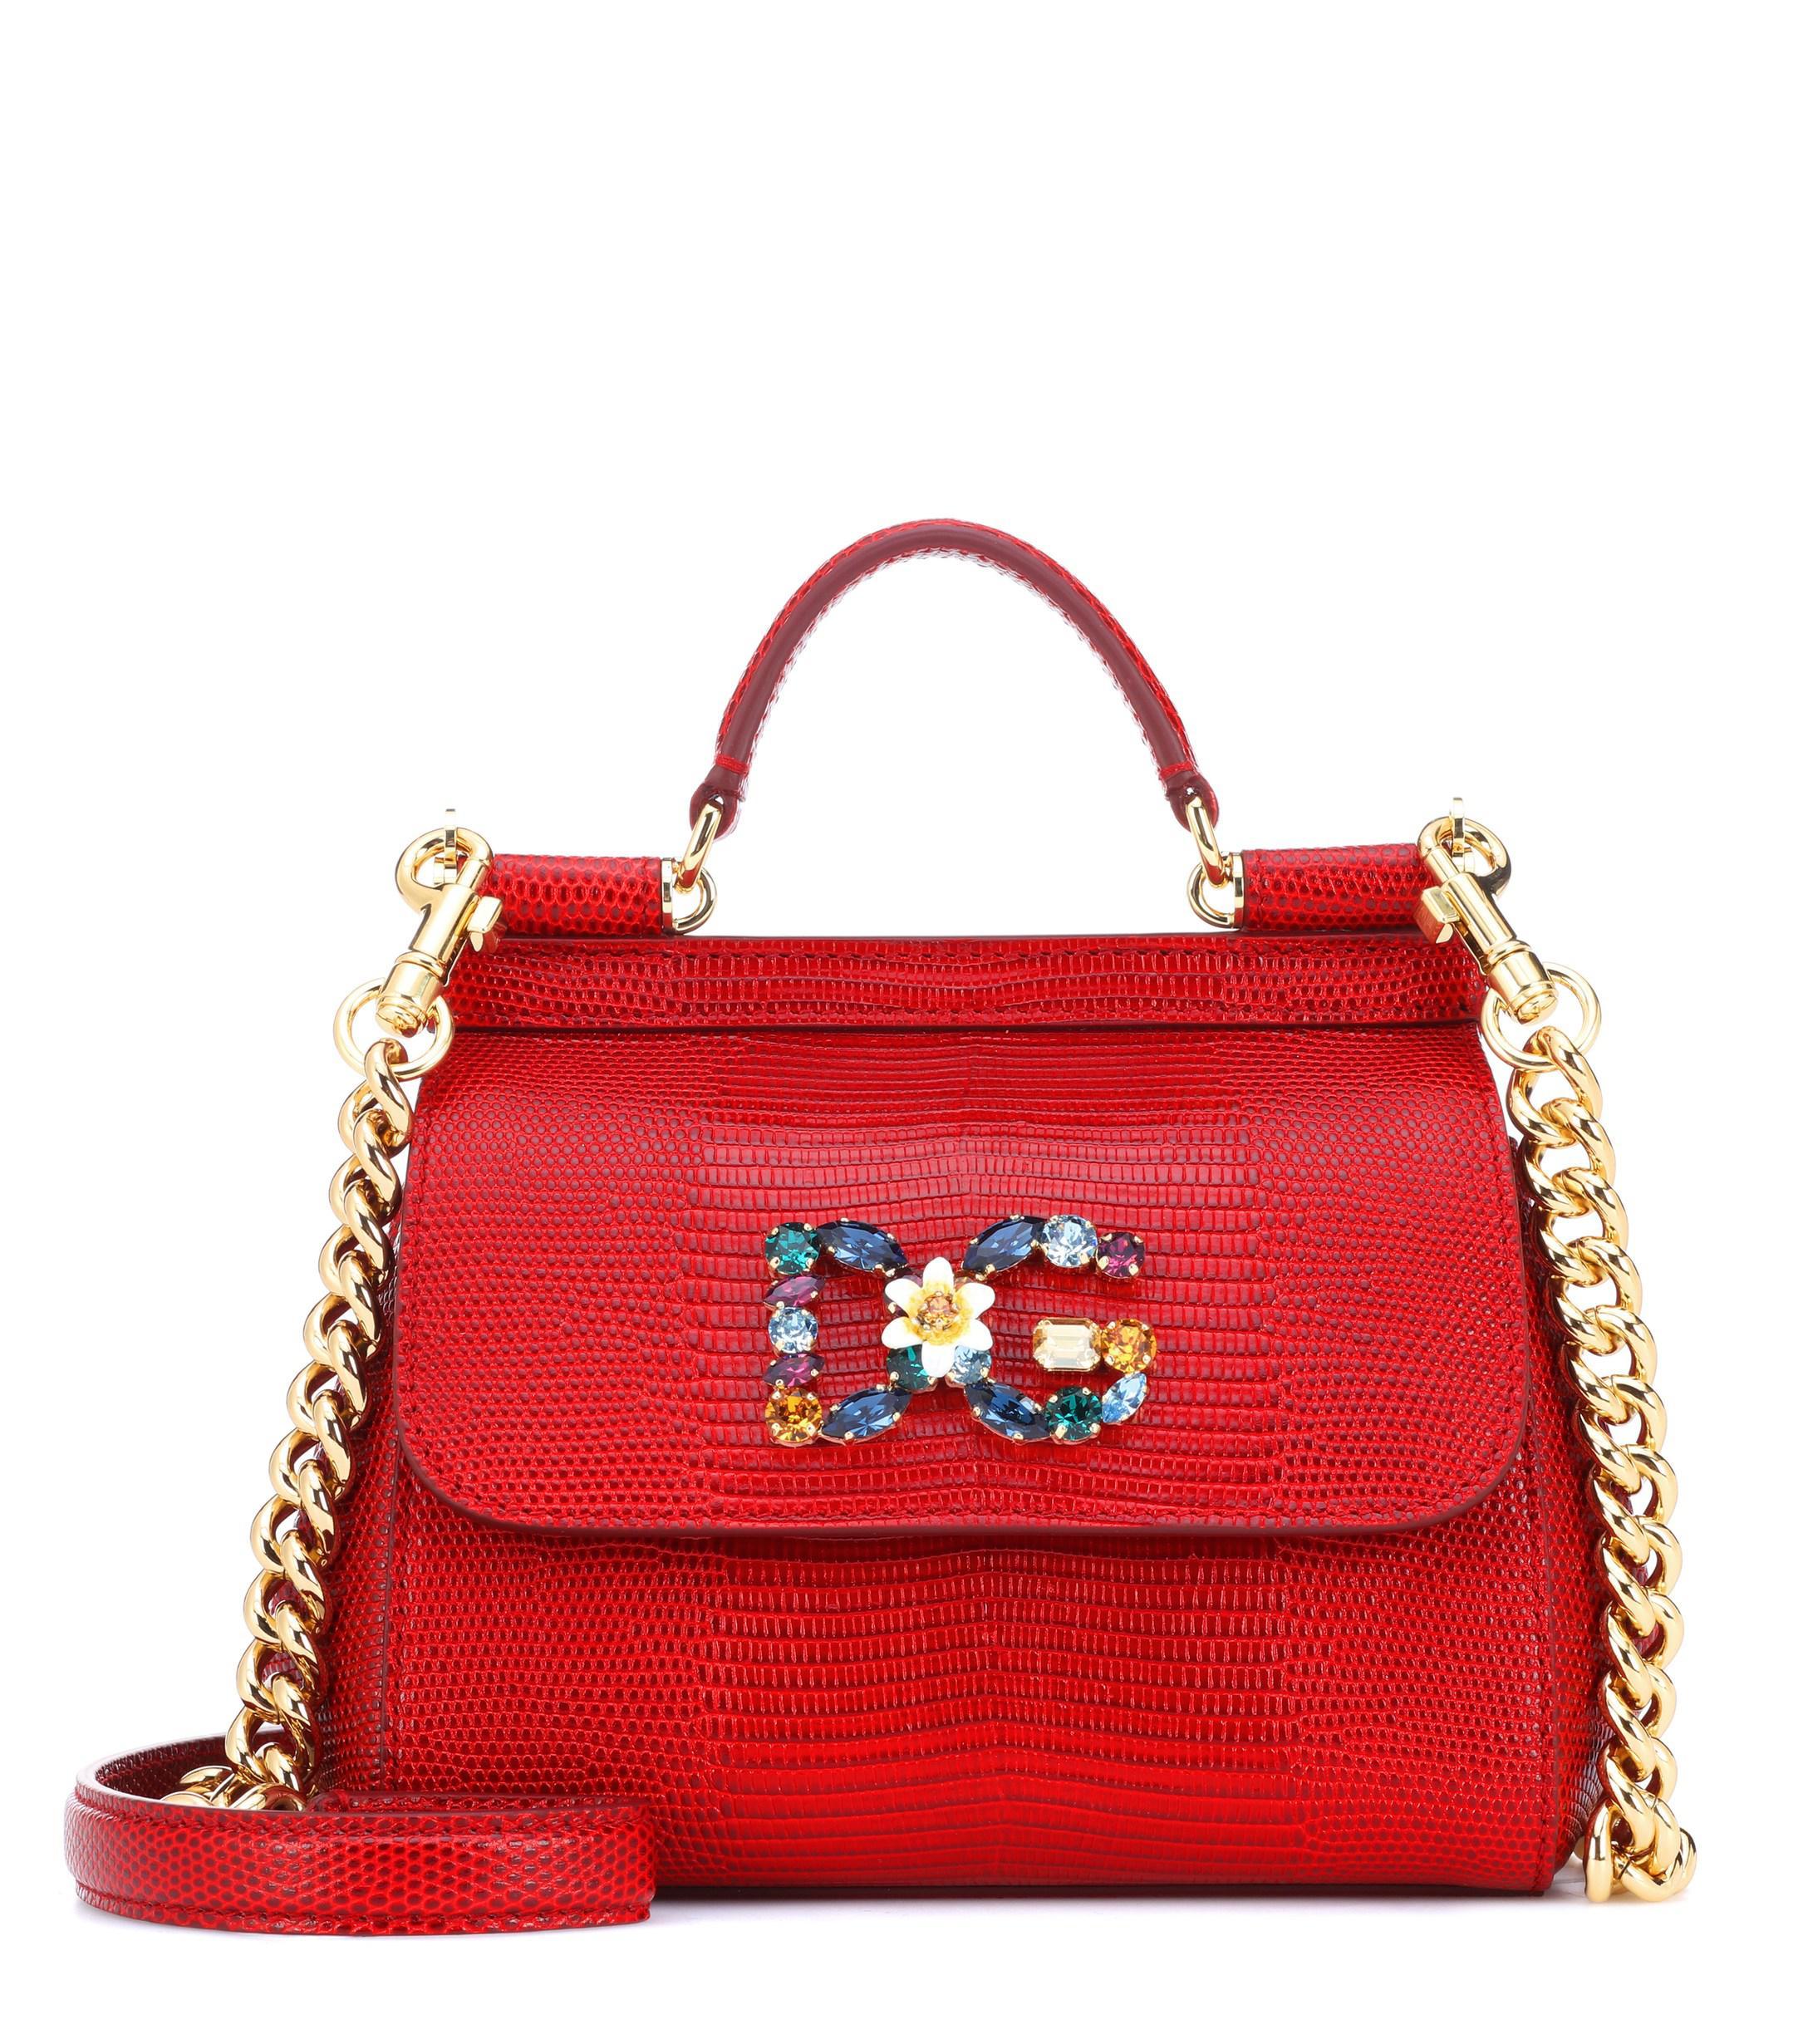 6f1f6a510f Lyst - Dolce   Gabbana Sicily Mini Leather Shoulder Bag in Red